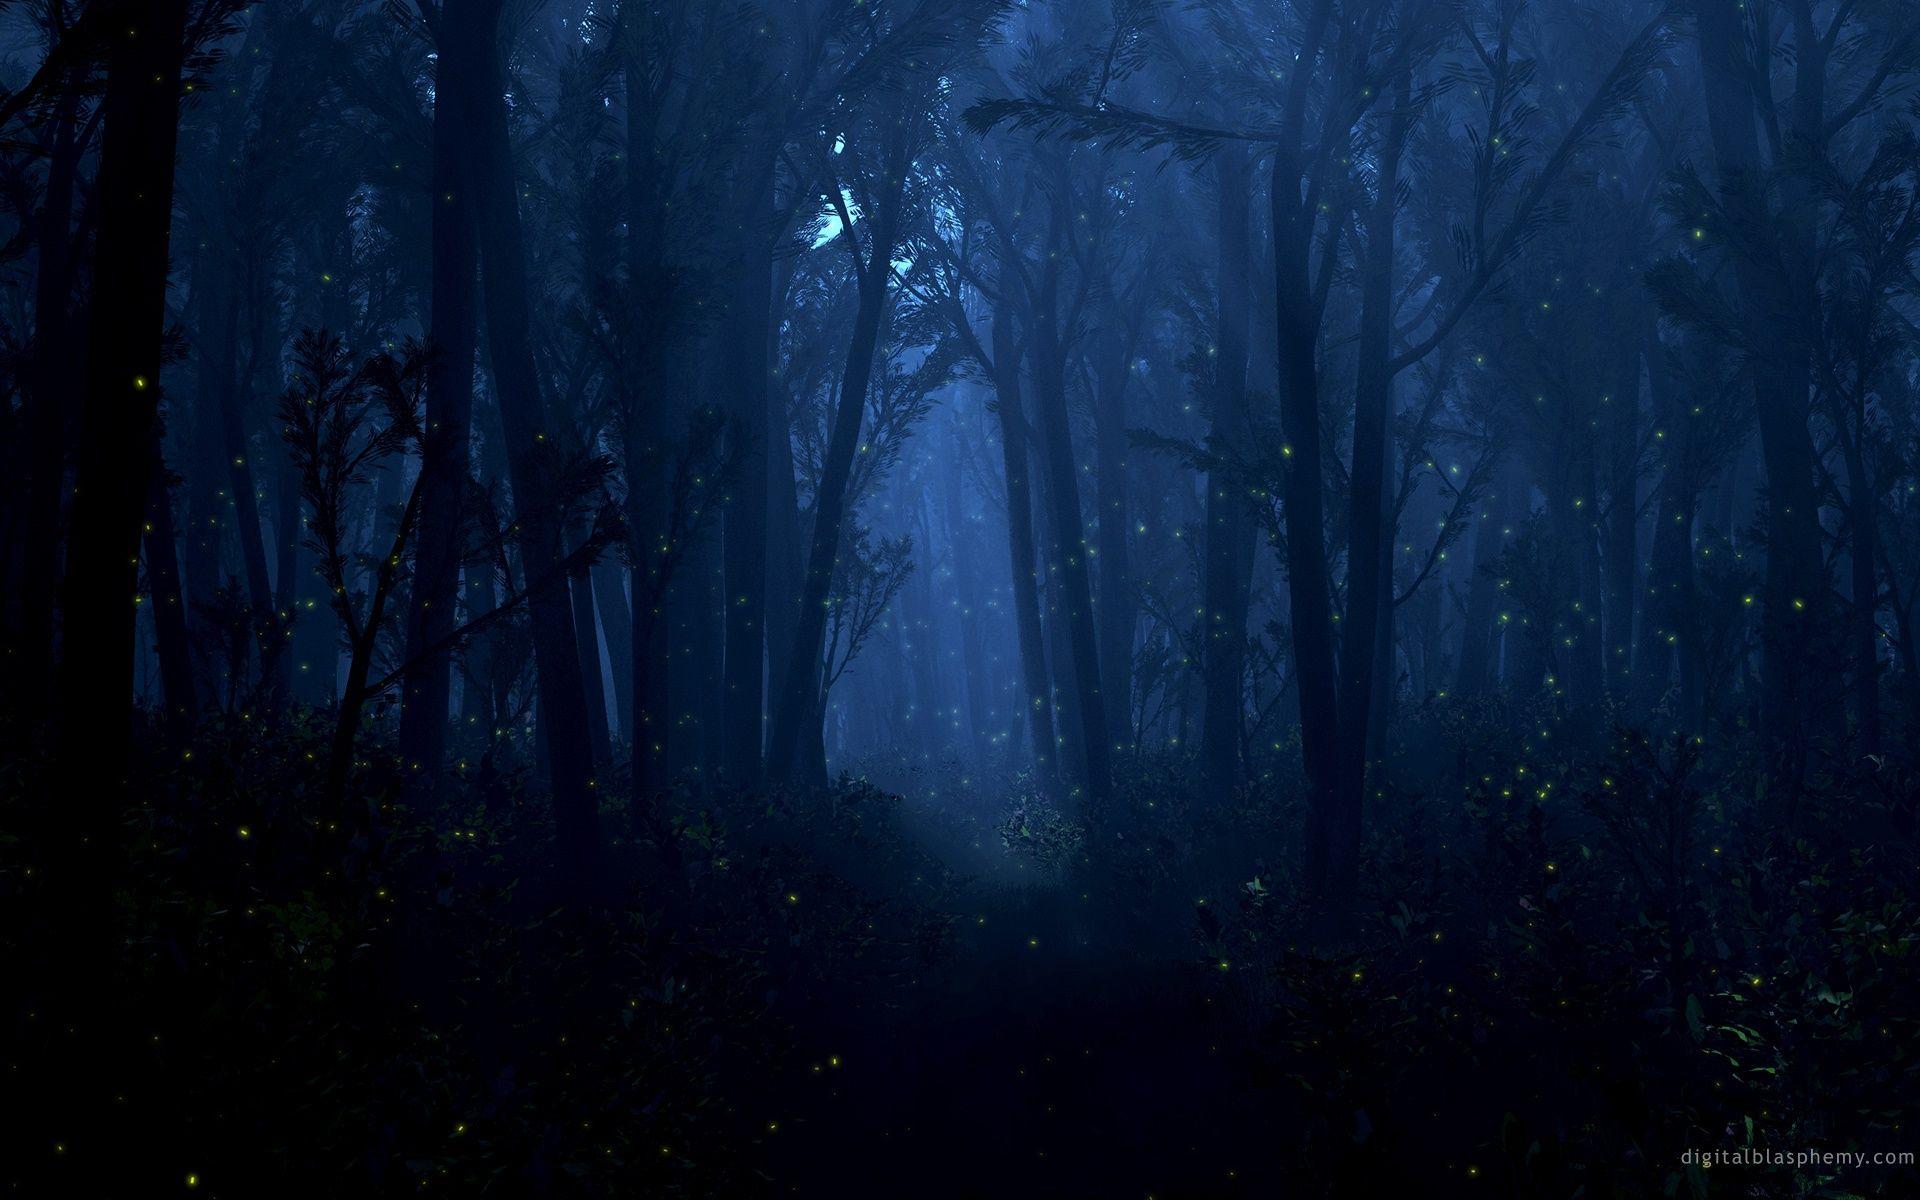 Moonlight Forest Wallpaper Widescreen For Desktop Background HD Resolution 1920x1200 Px 51877 KB